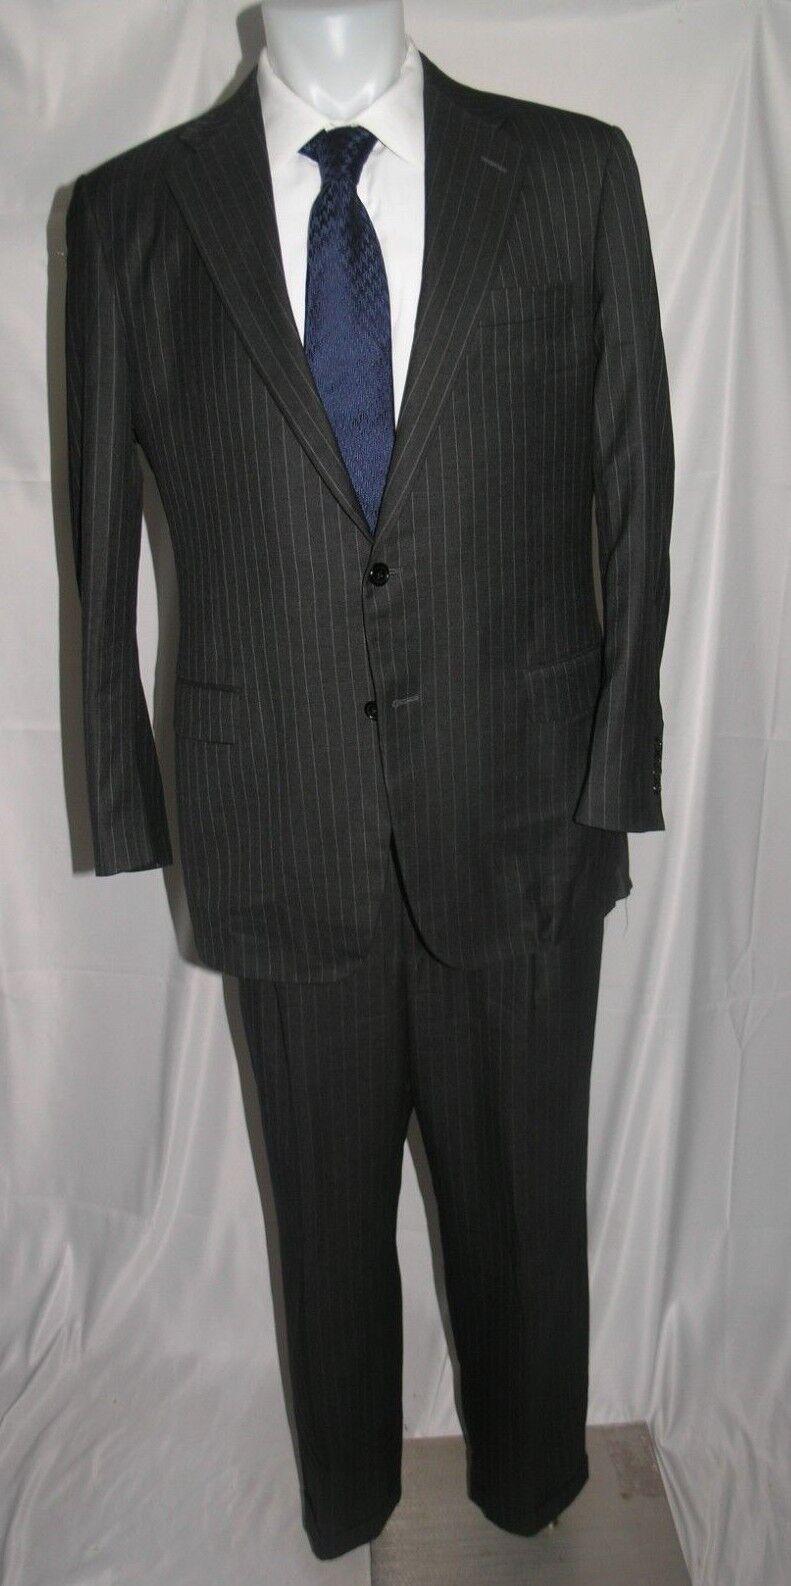 Hickey kostenlosman Addison LGold Piana Super 150 Charcoal Striped Two Button Suit 42L